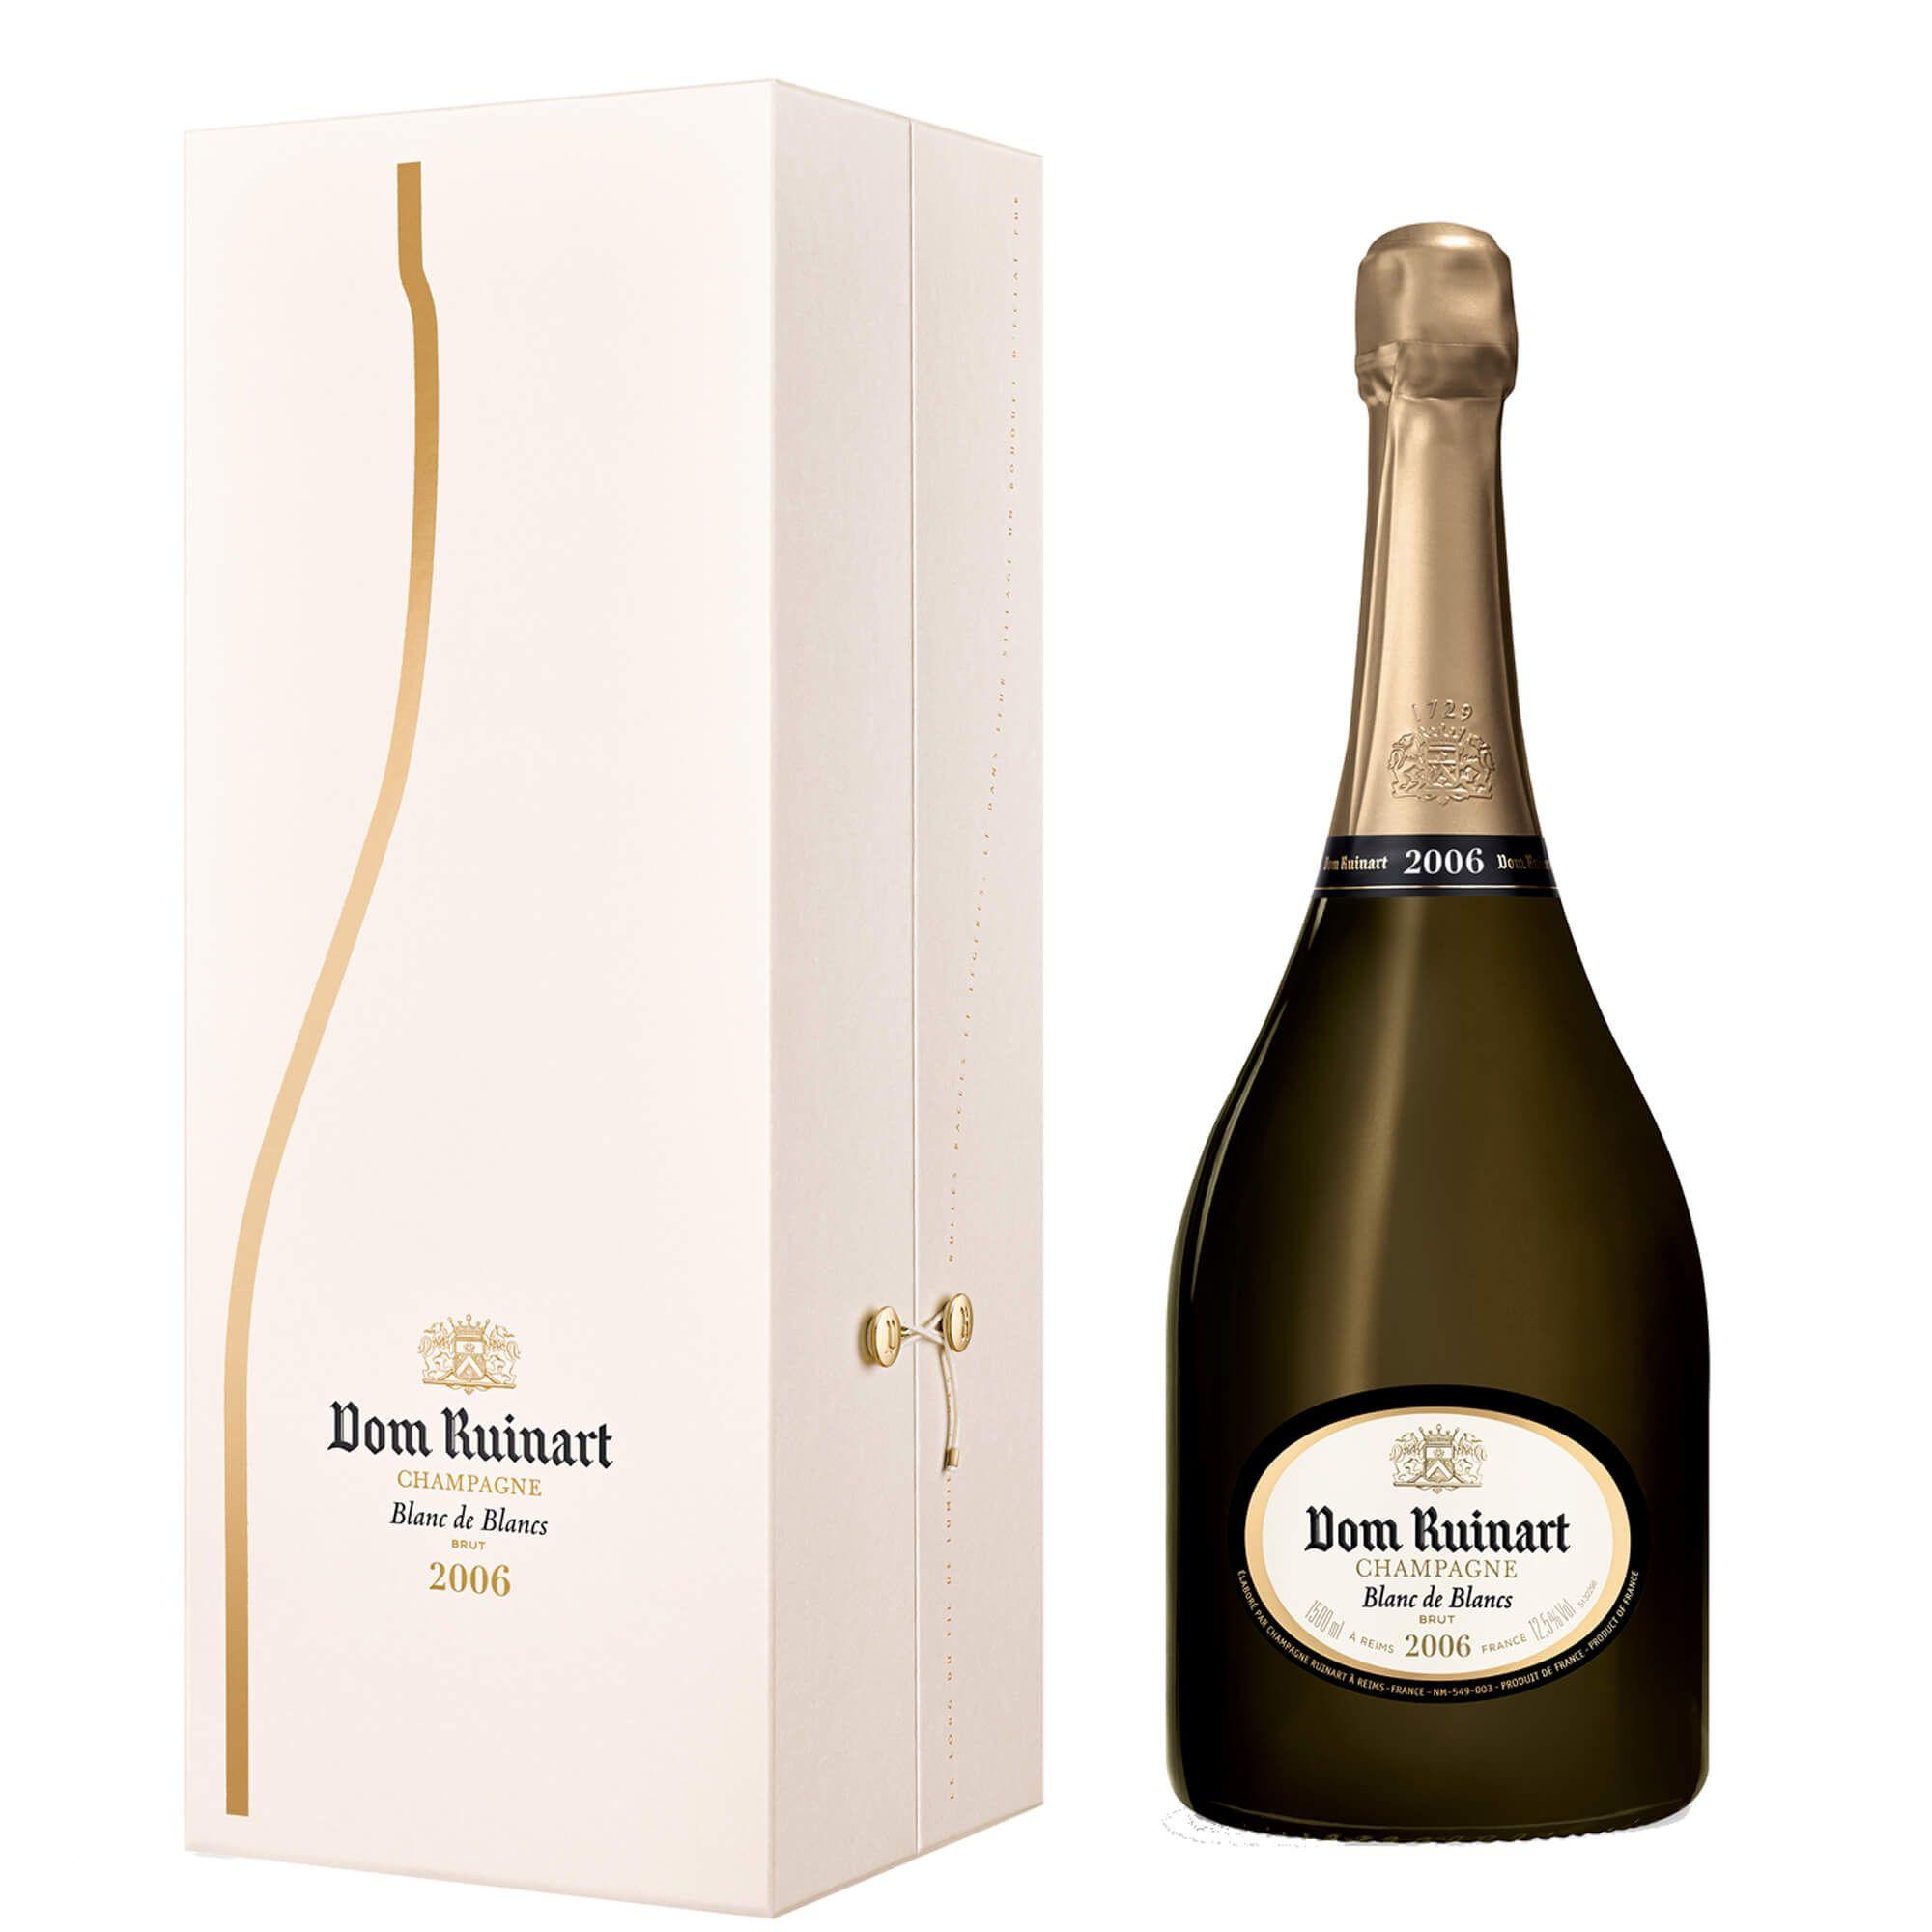 Champagne Dom Ruinart 2006 Magnum - Moët & Chandon